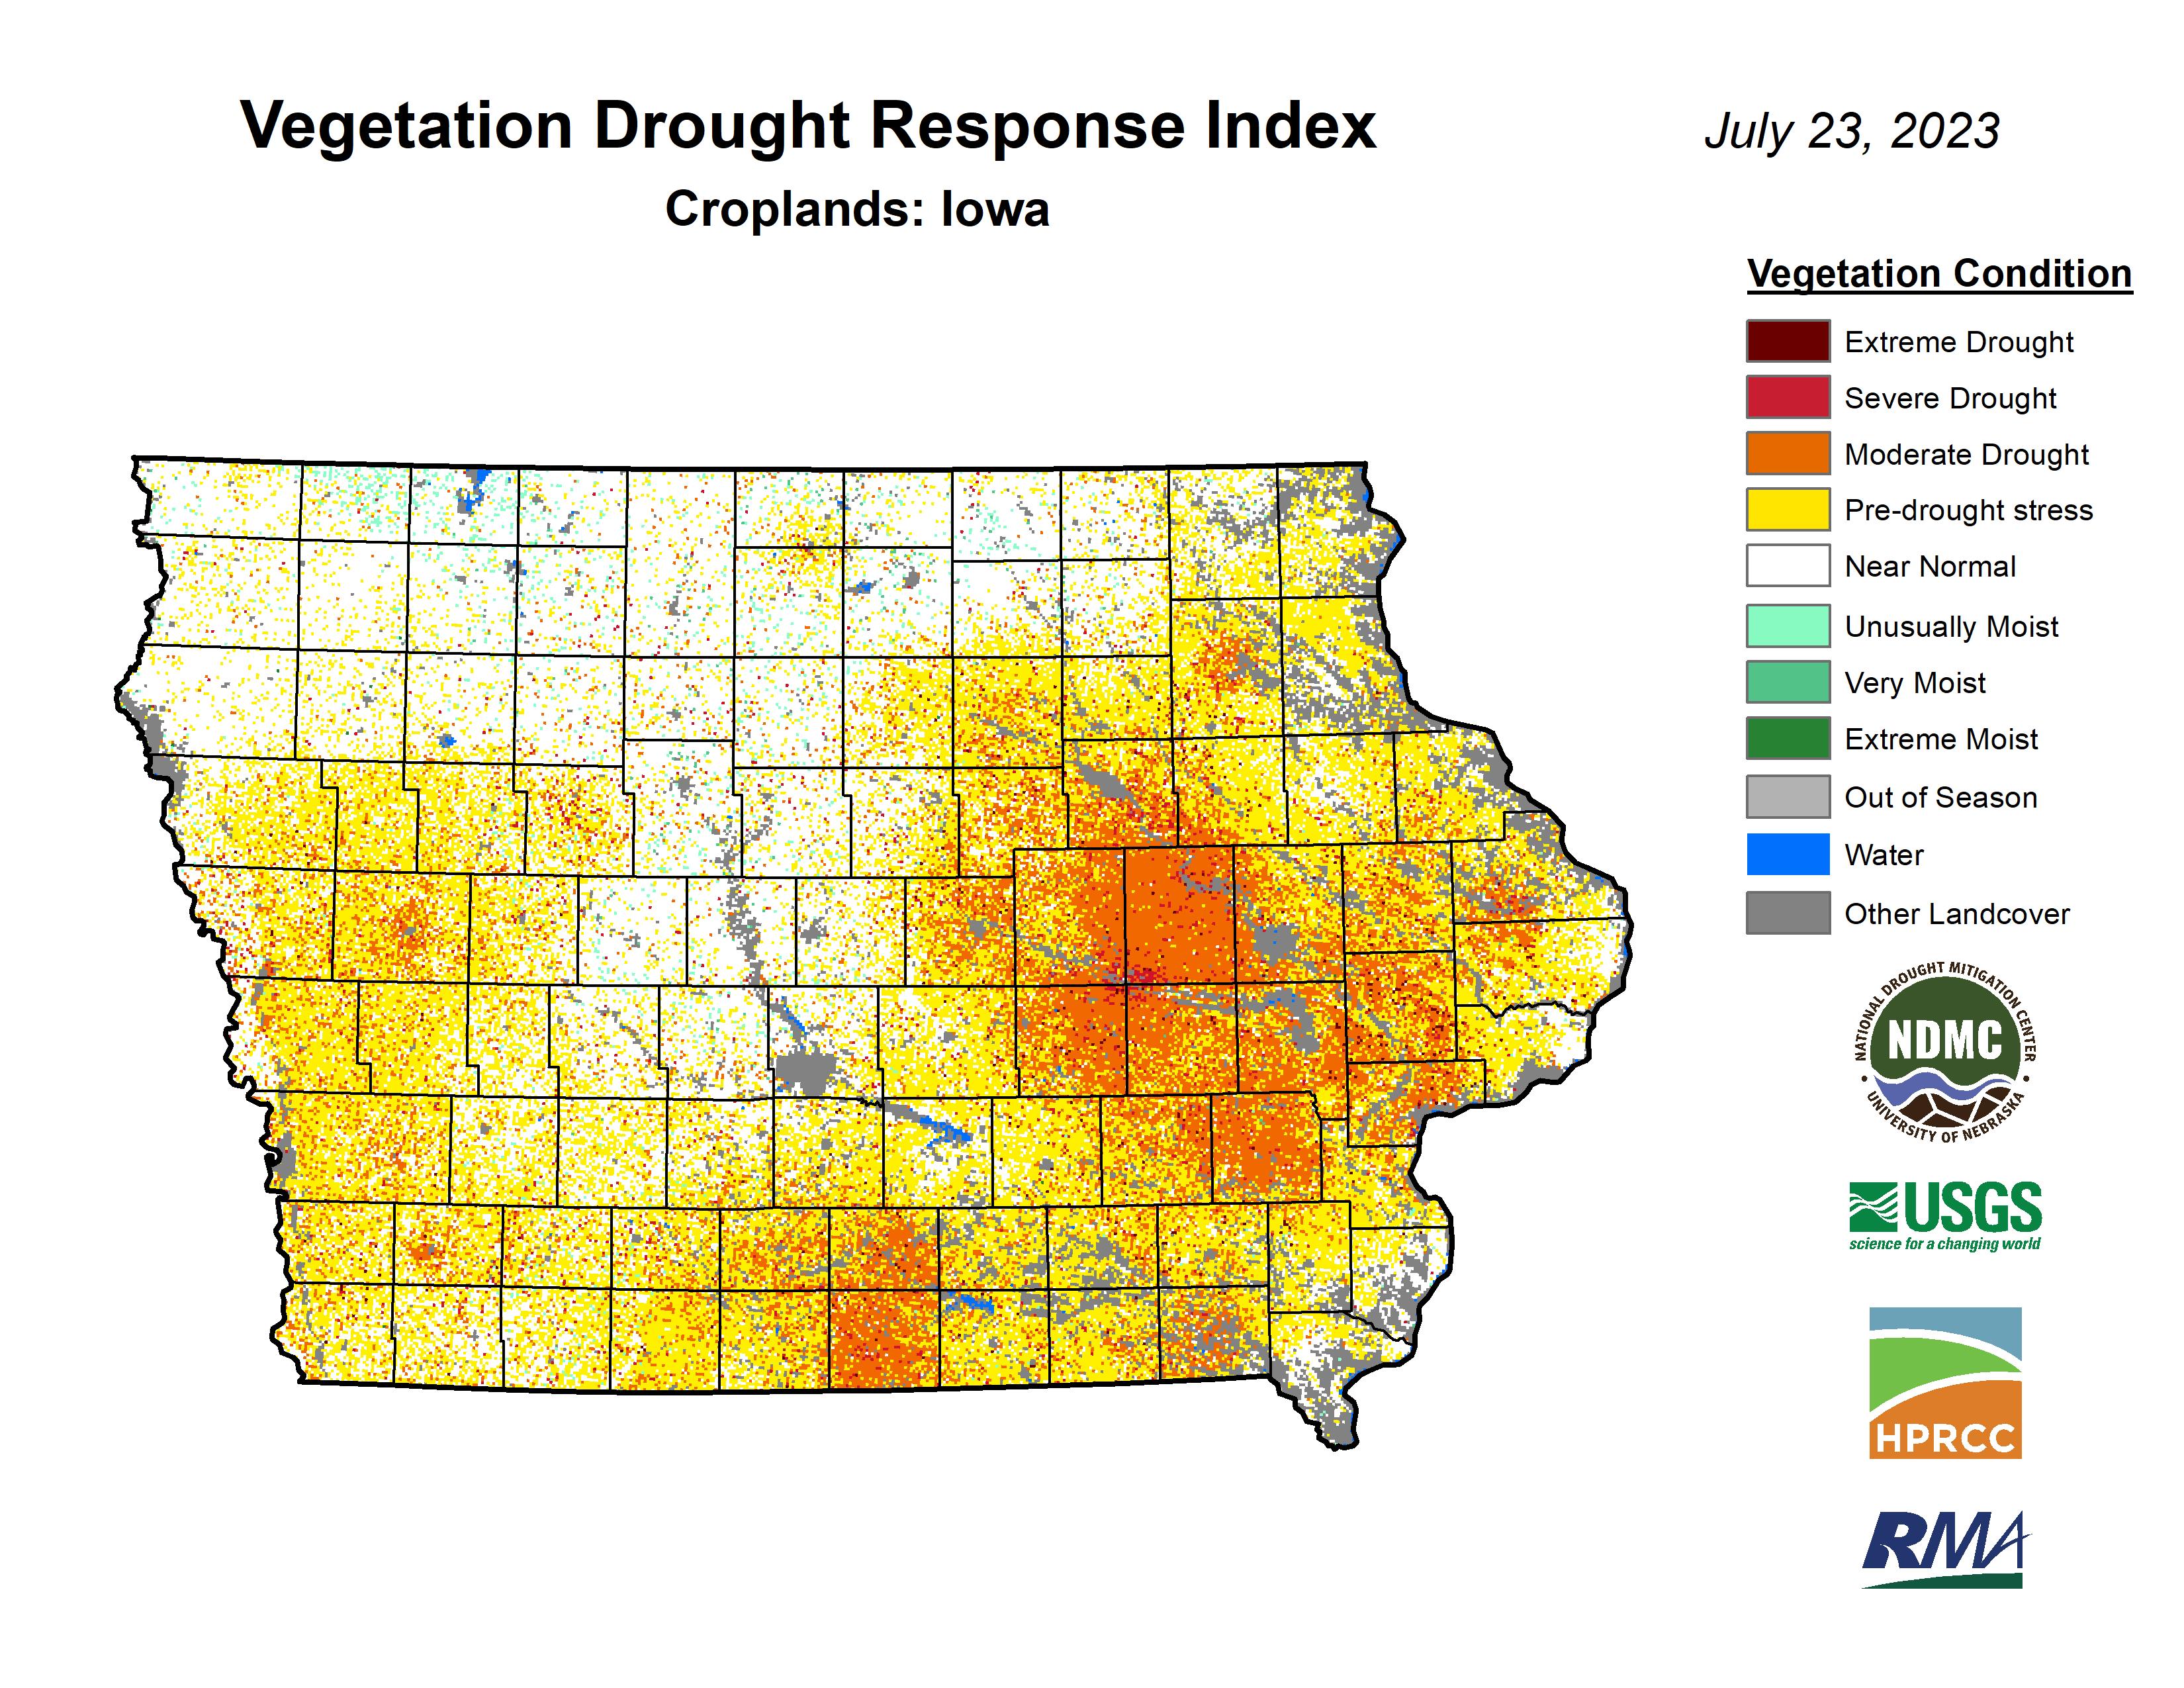 Vegetation Drought Response Index (VegDRI), crops, Iowa